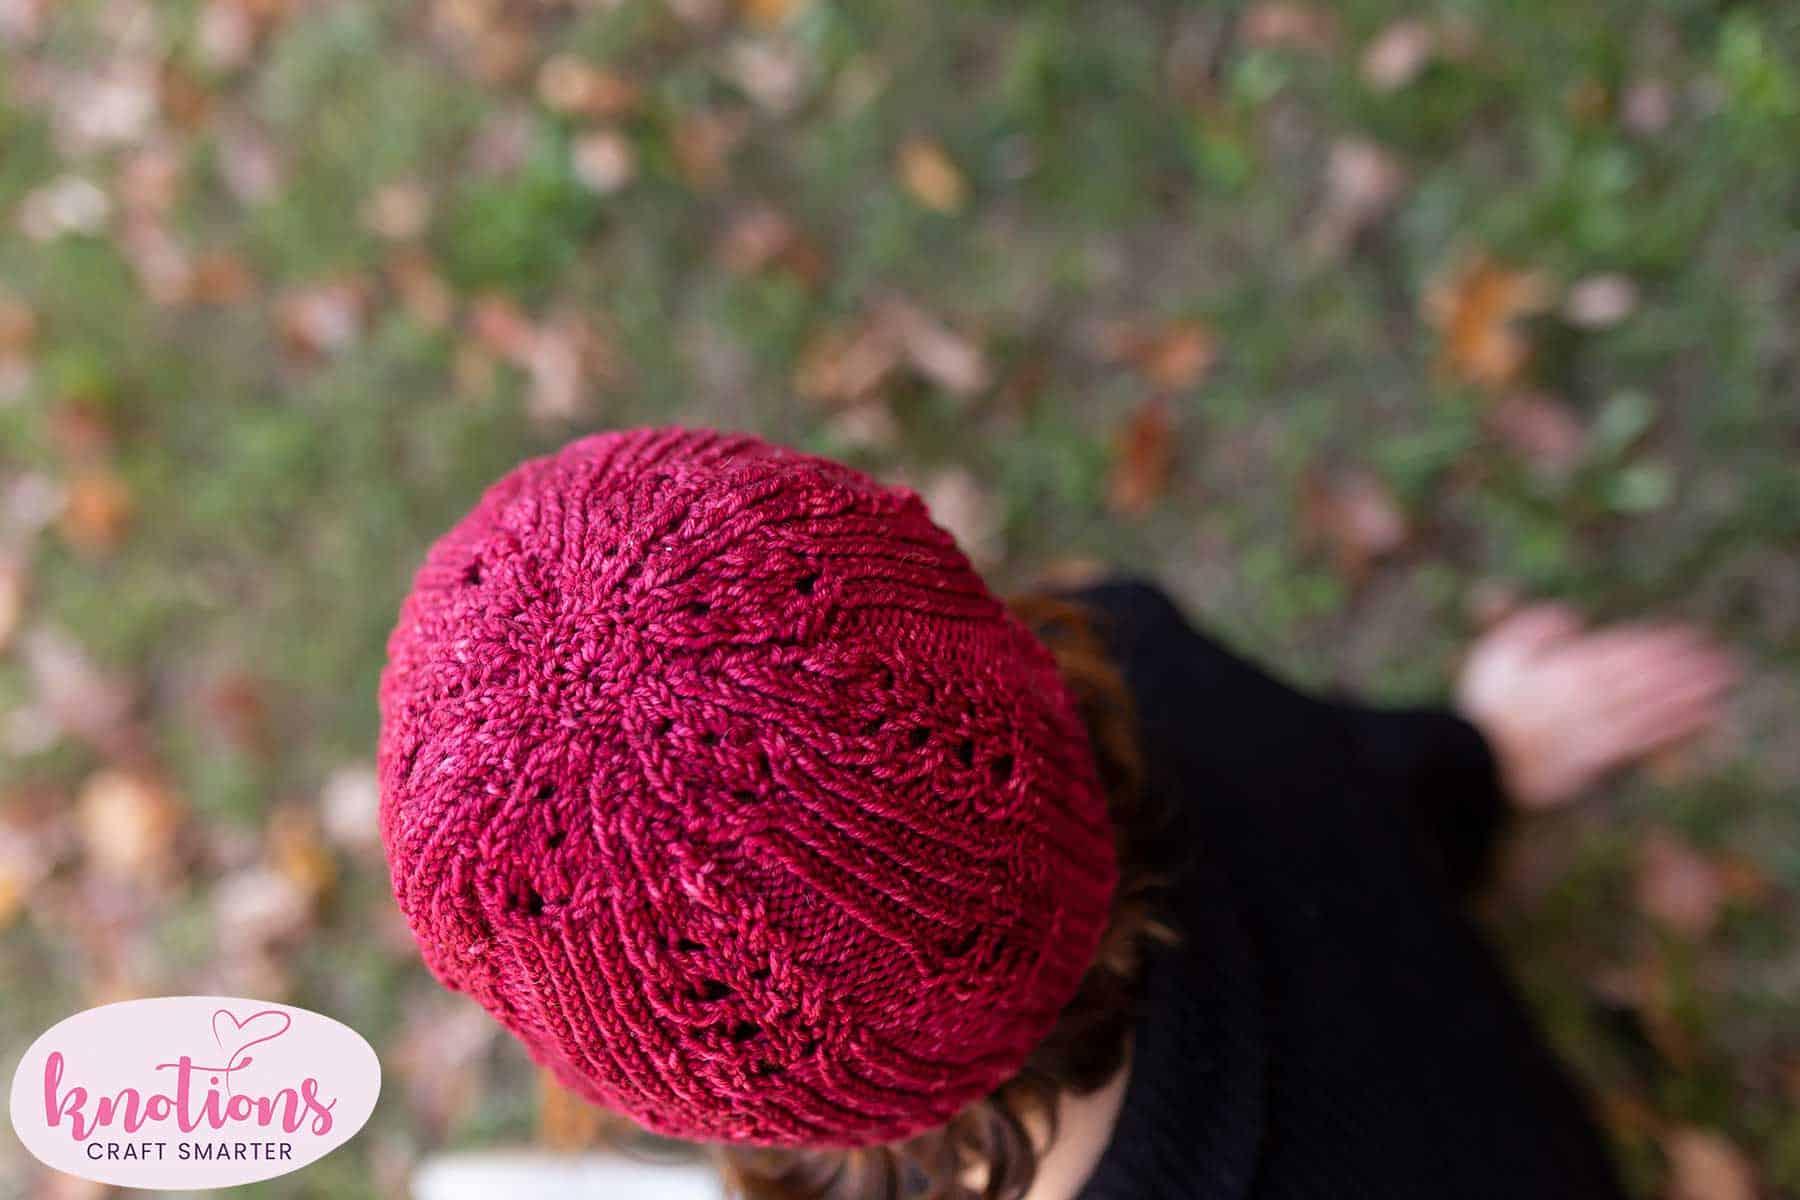 cranberry_pie_hat_10